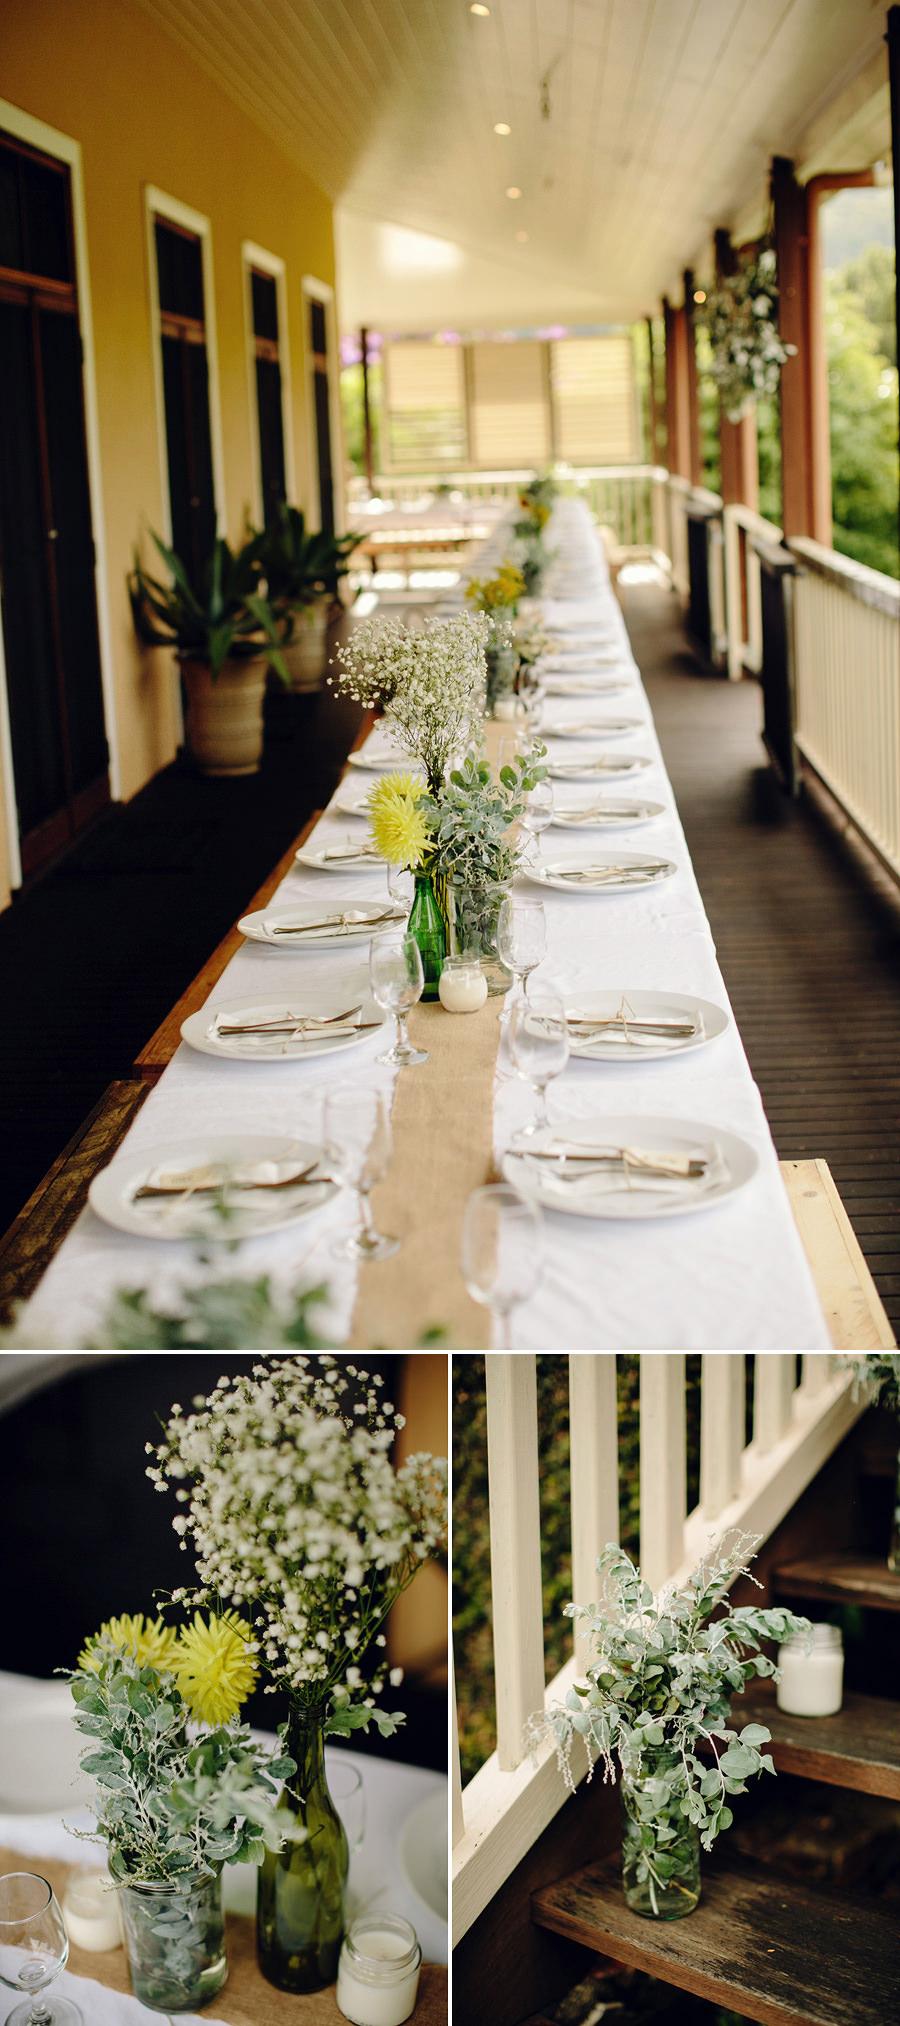 Vintage Wedding Photographer: Reception Details